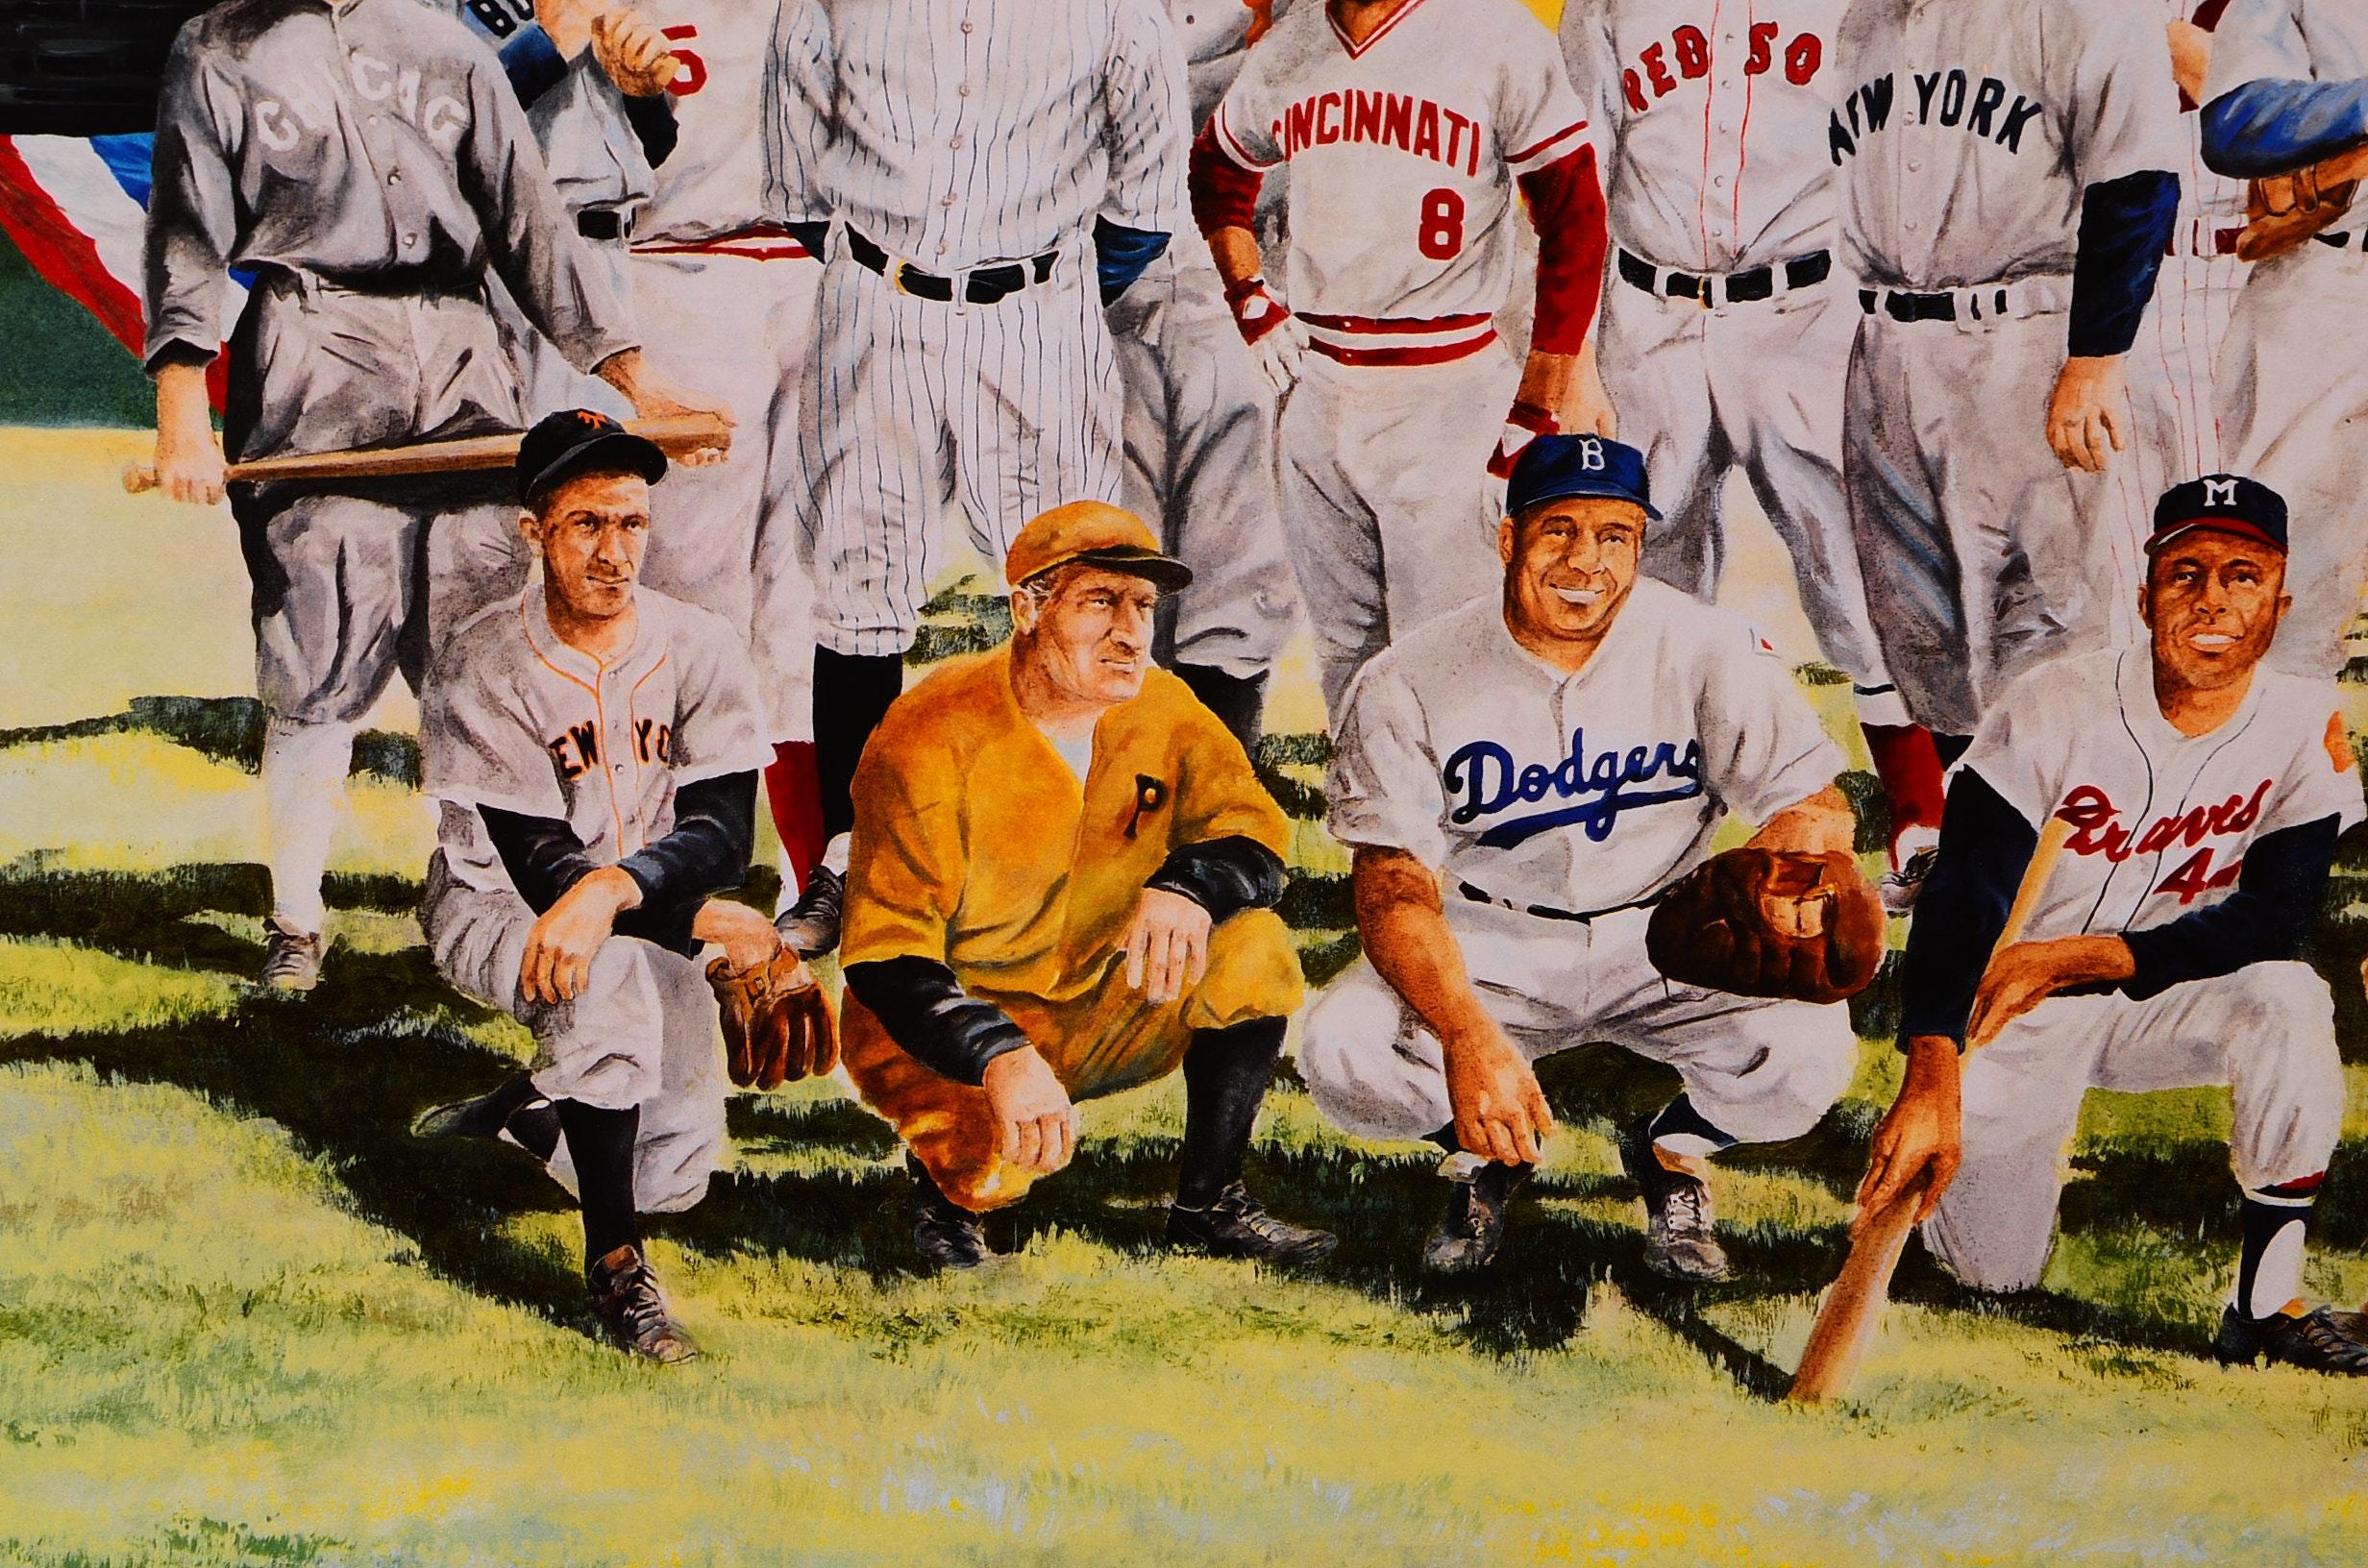 MLB Baseball s Greatest Rivalries Details